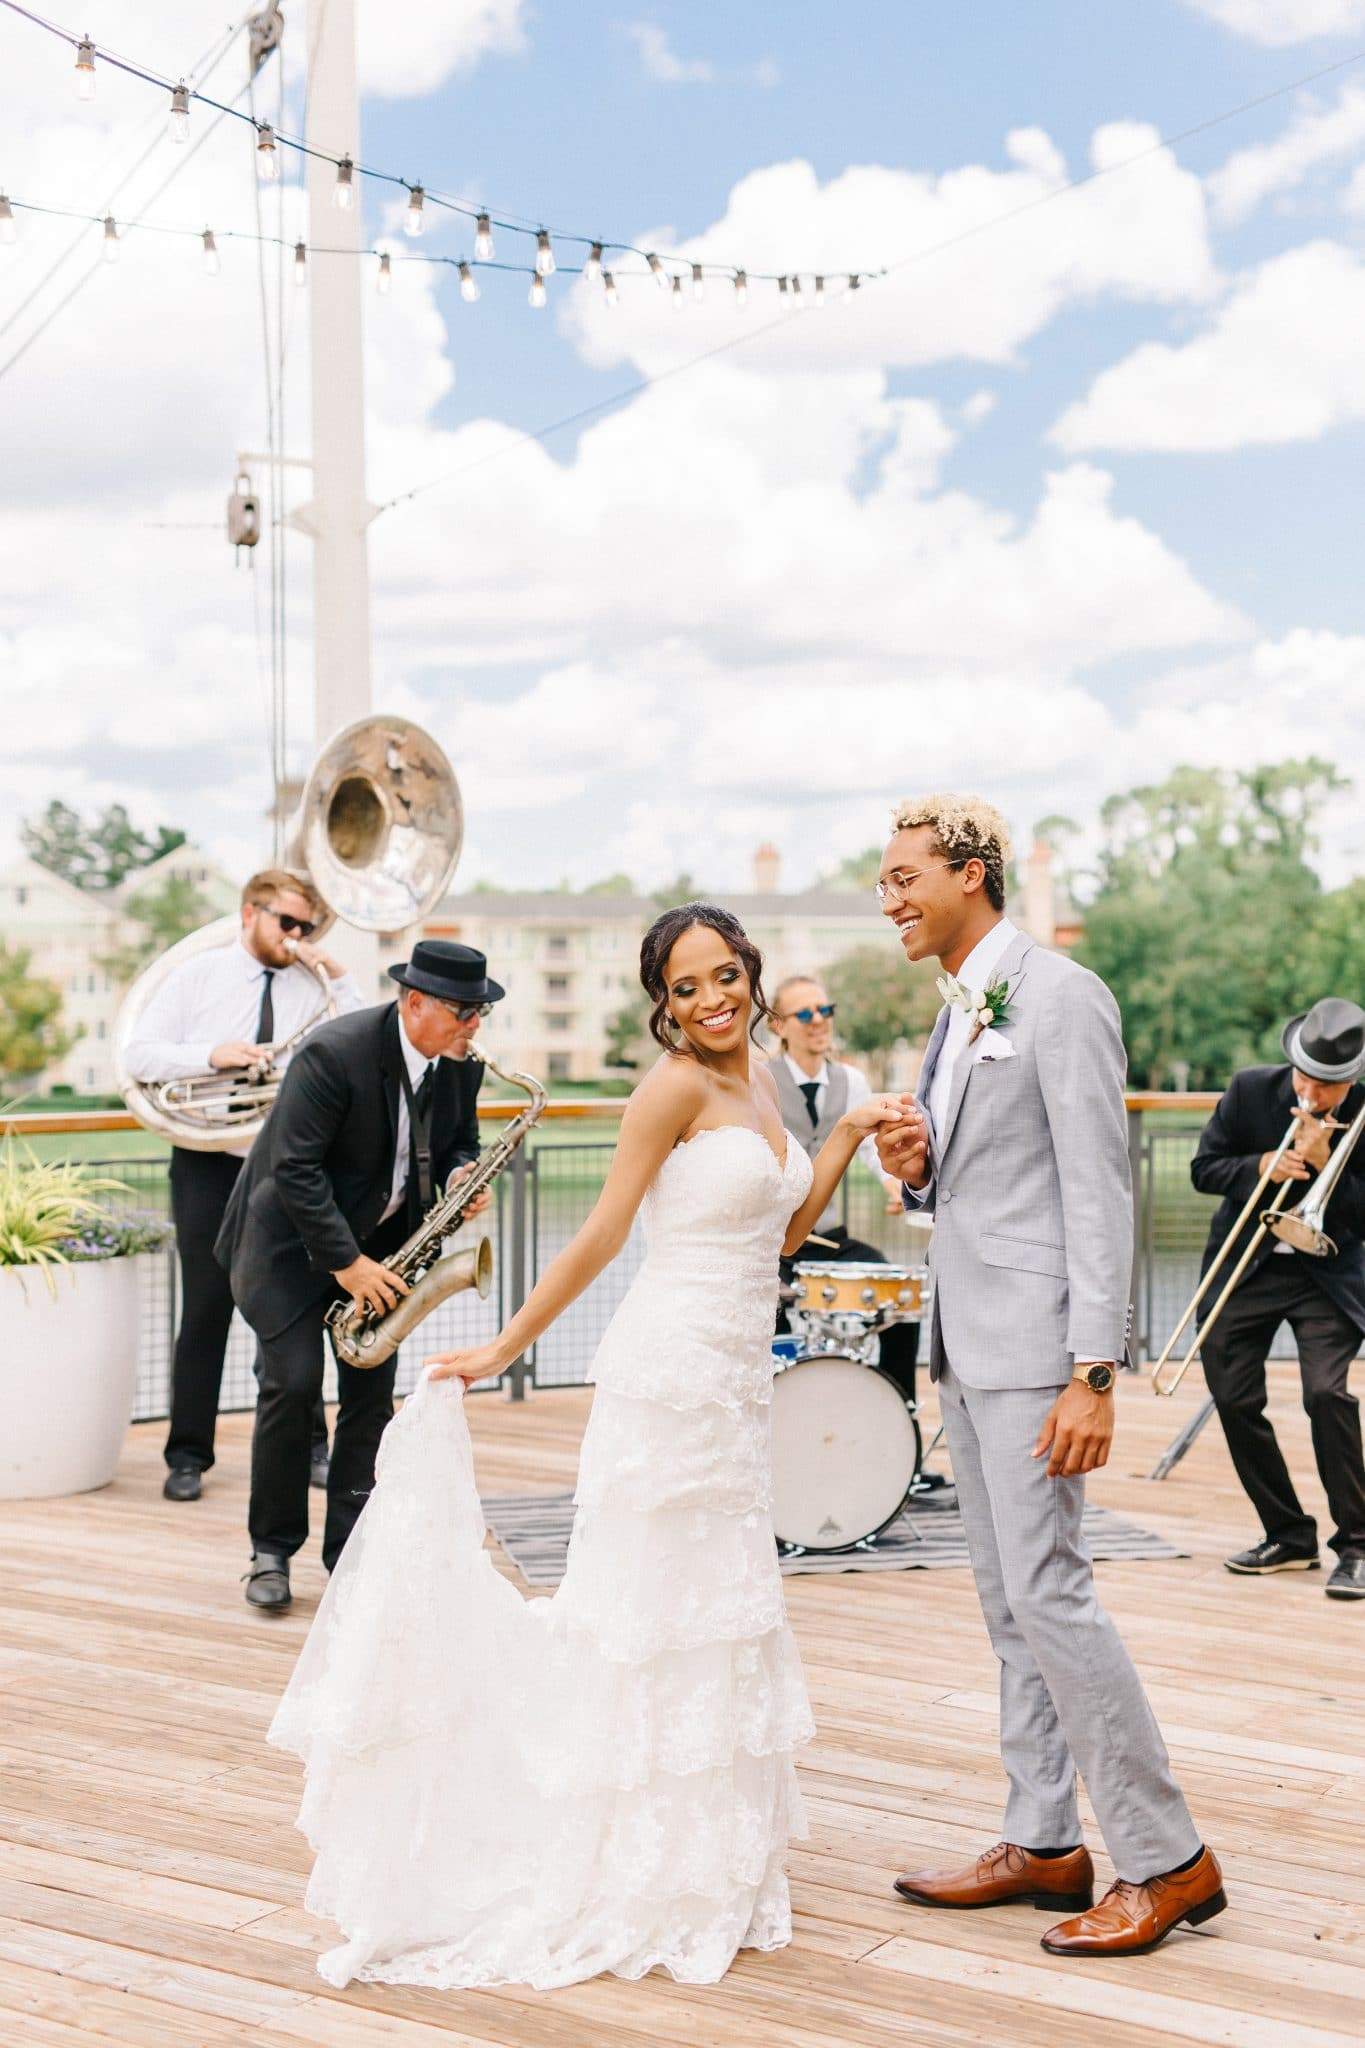 brass band bride and groom dancing Disney Princess and the Frog Wedding Theme